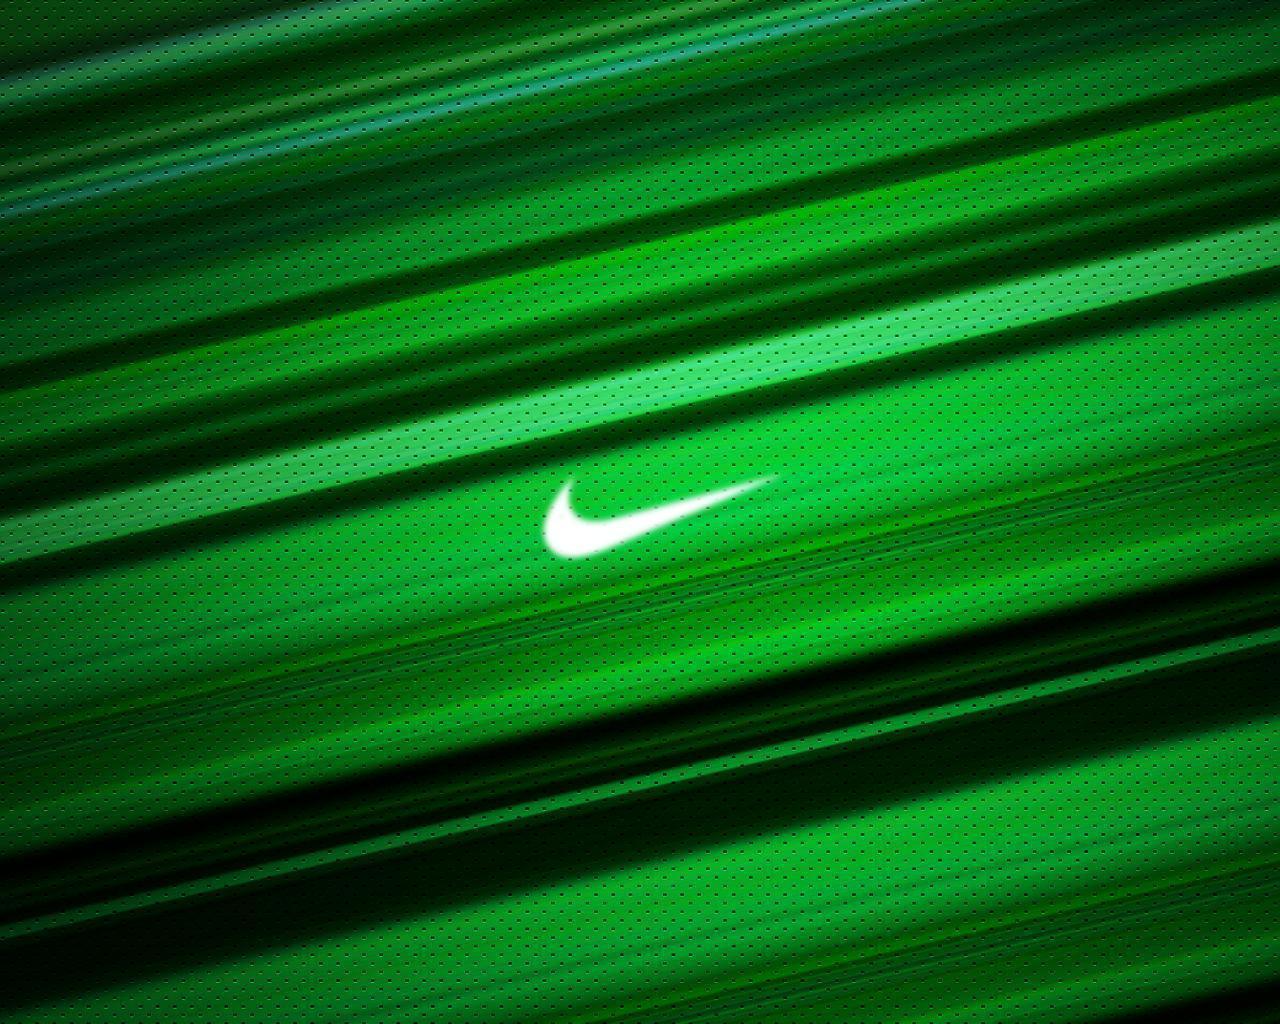 Nike Wallpapers Hd Green Wallpaper Cave